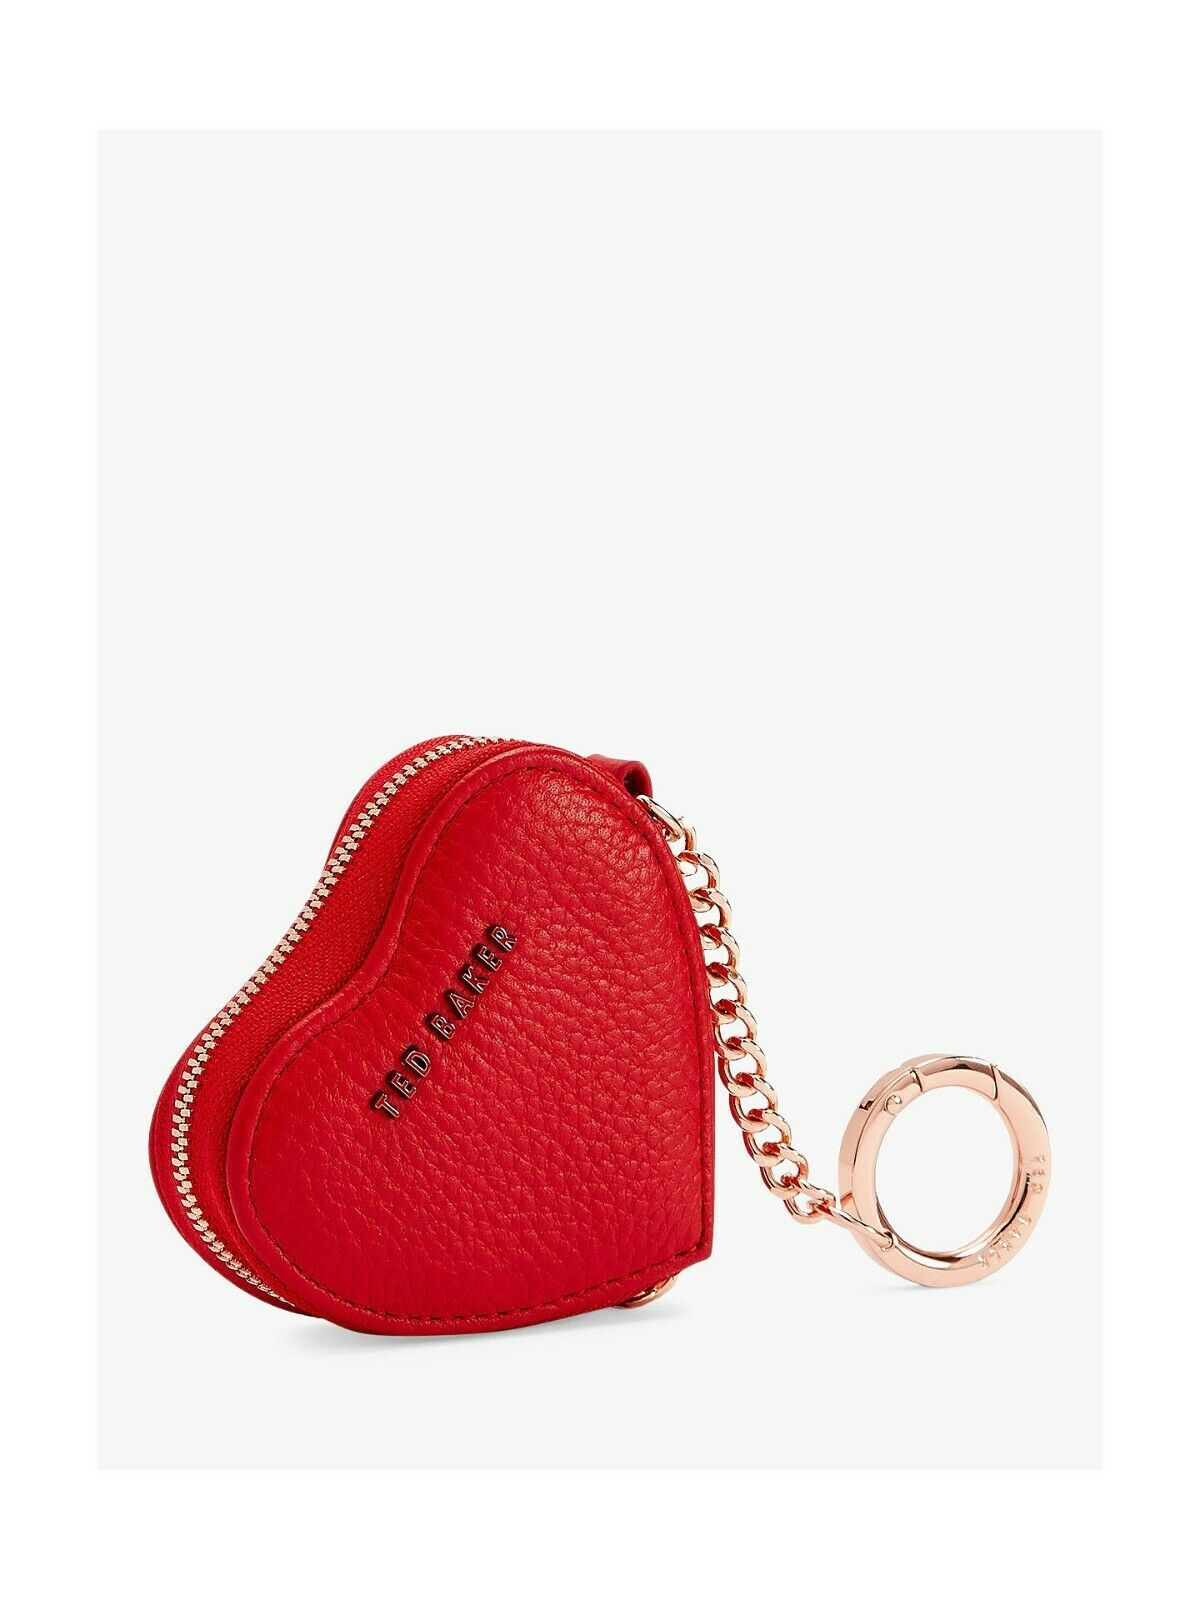 Red leather tassel Heart charm Red leather keychain Heart pendant Red heart Bag charm Red leather bag Tassel bag Gift ideas